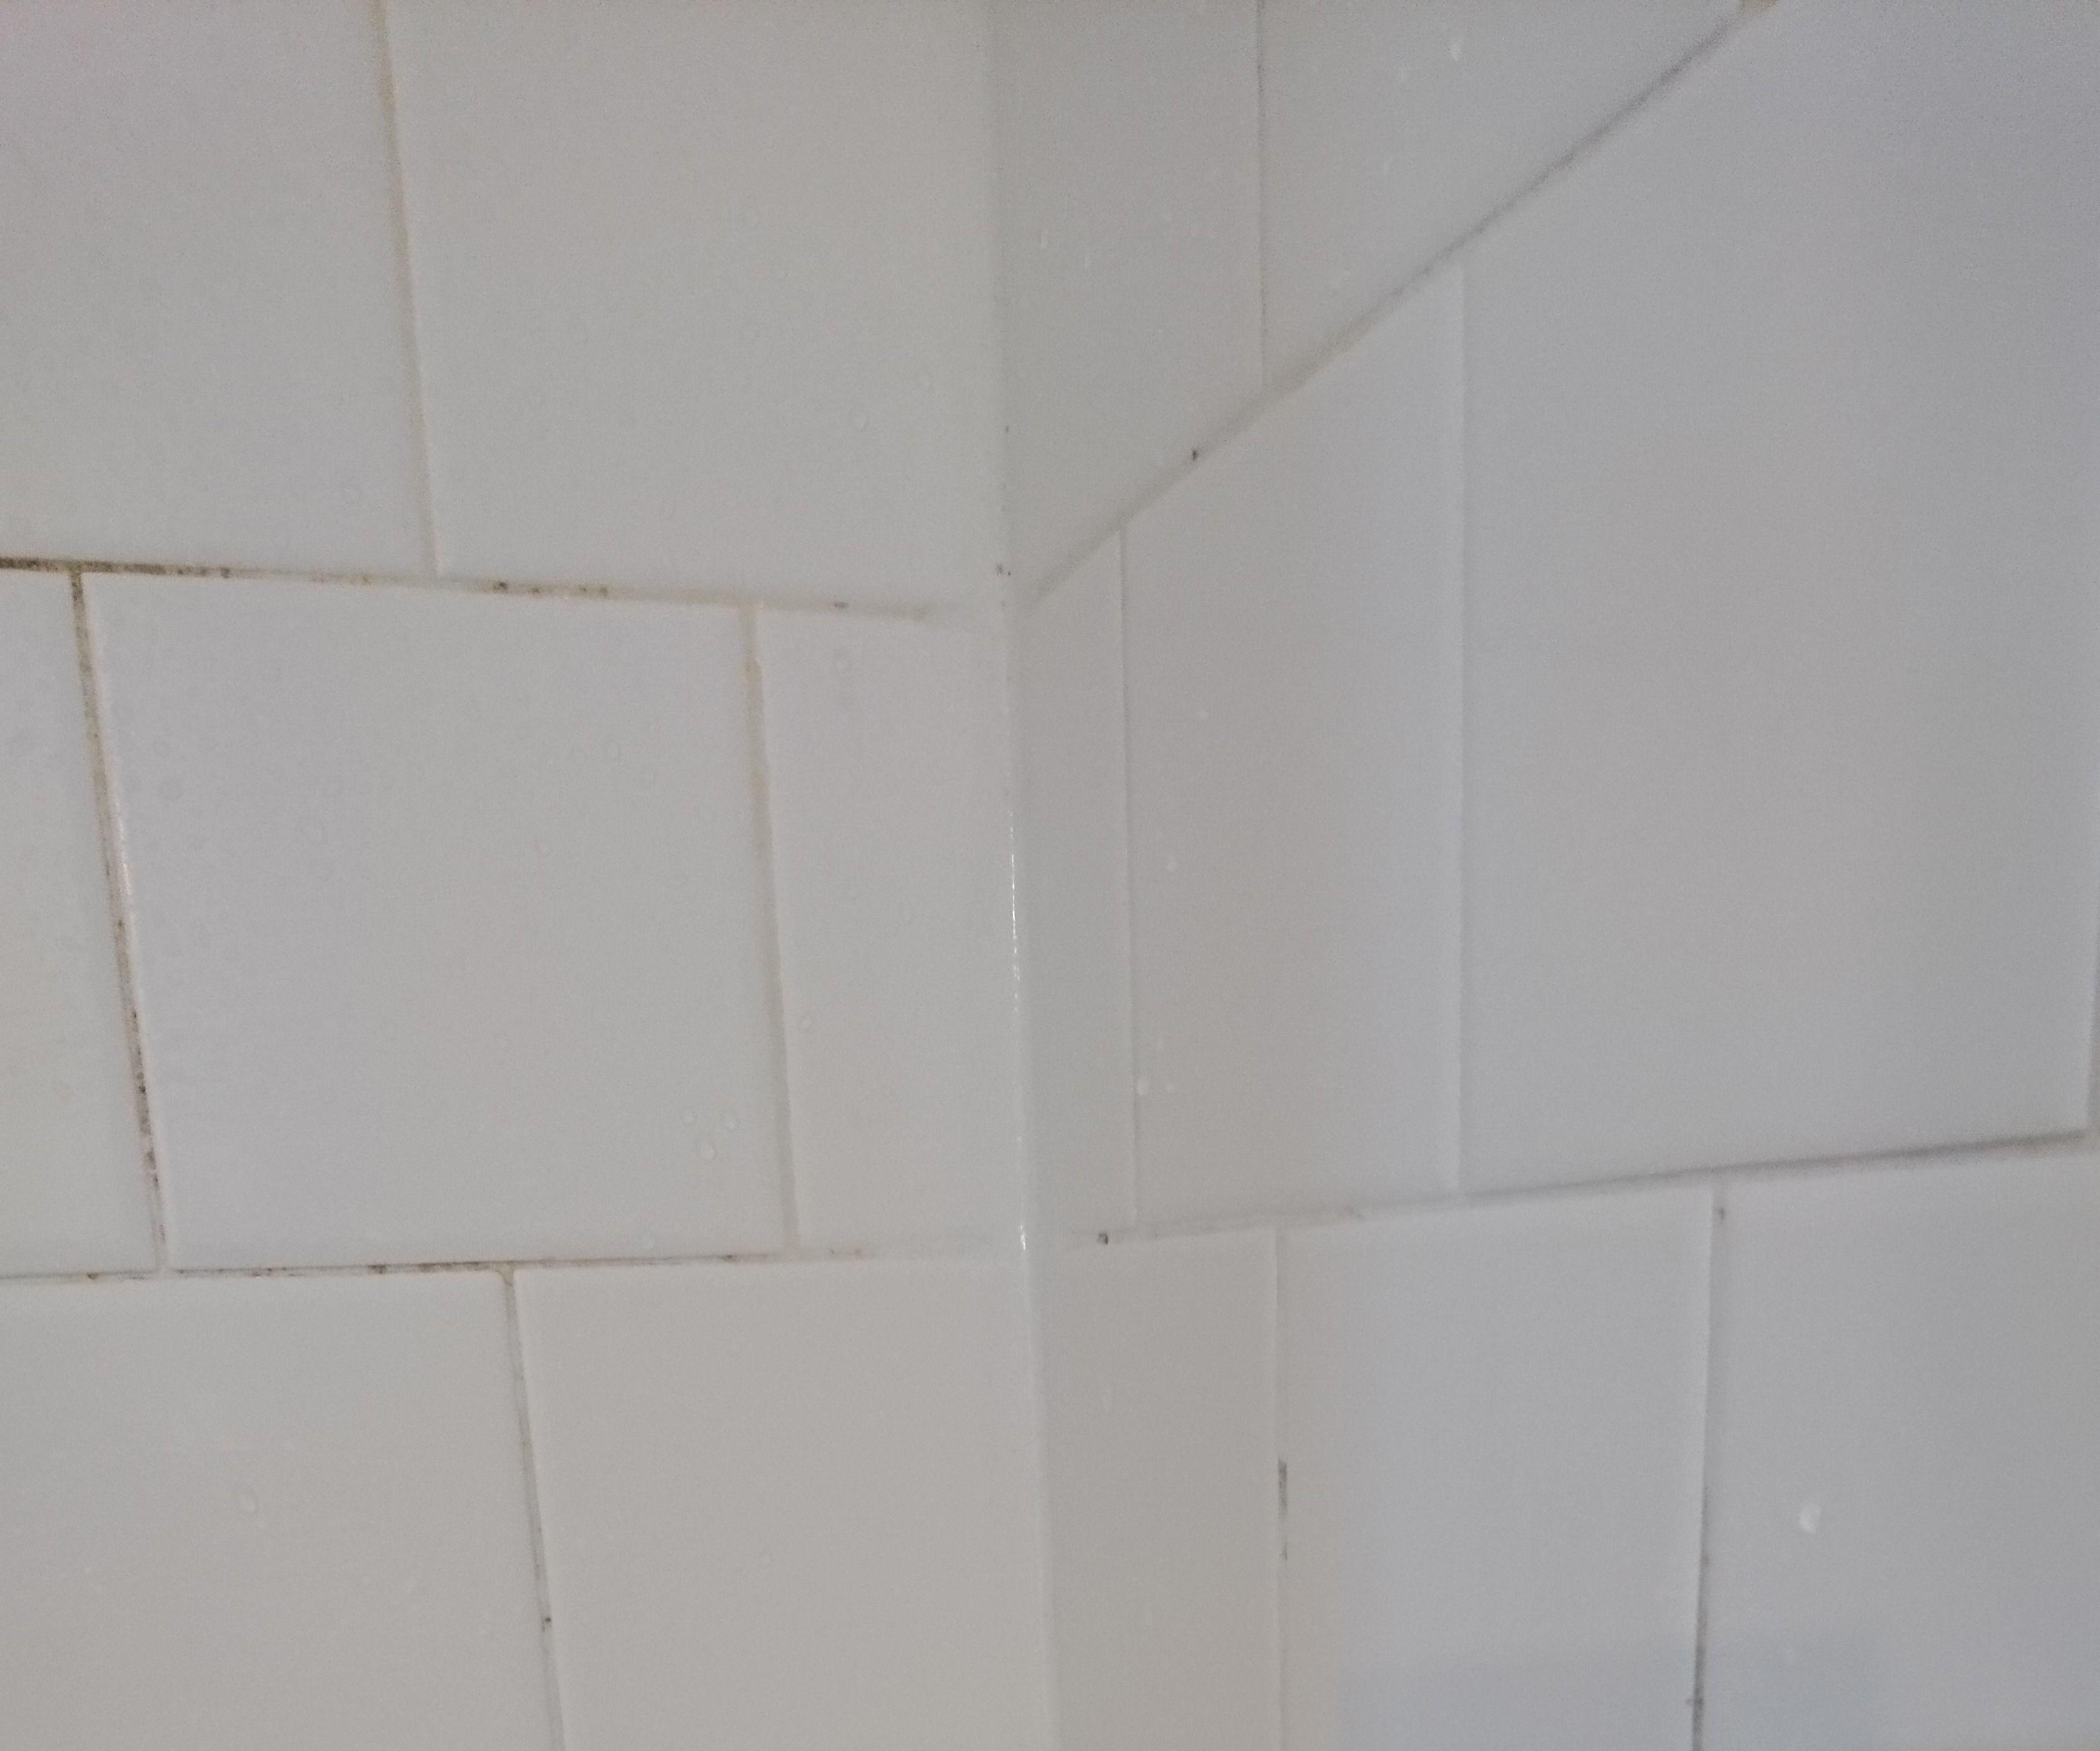 Clean Blackened Caulking in Bathroom